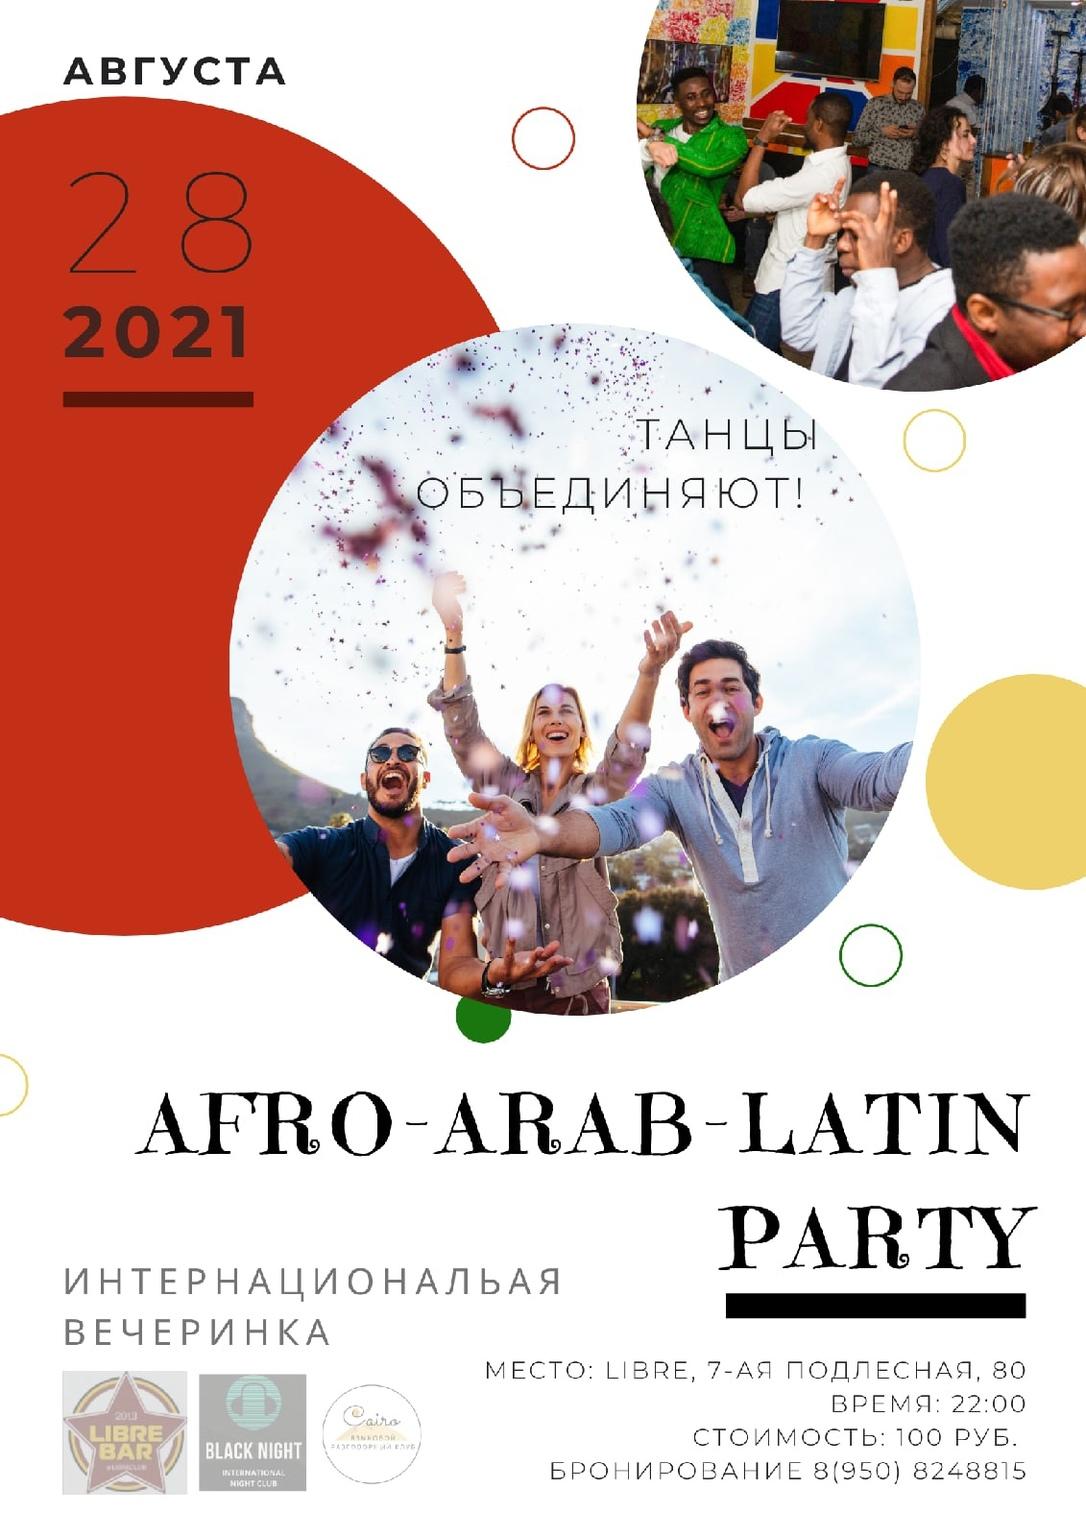 Афро-арабо-латино вечеринка